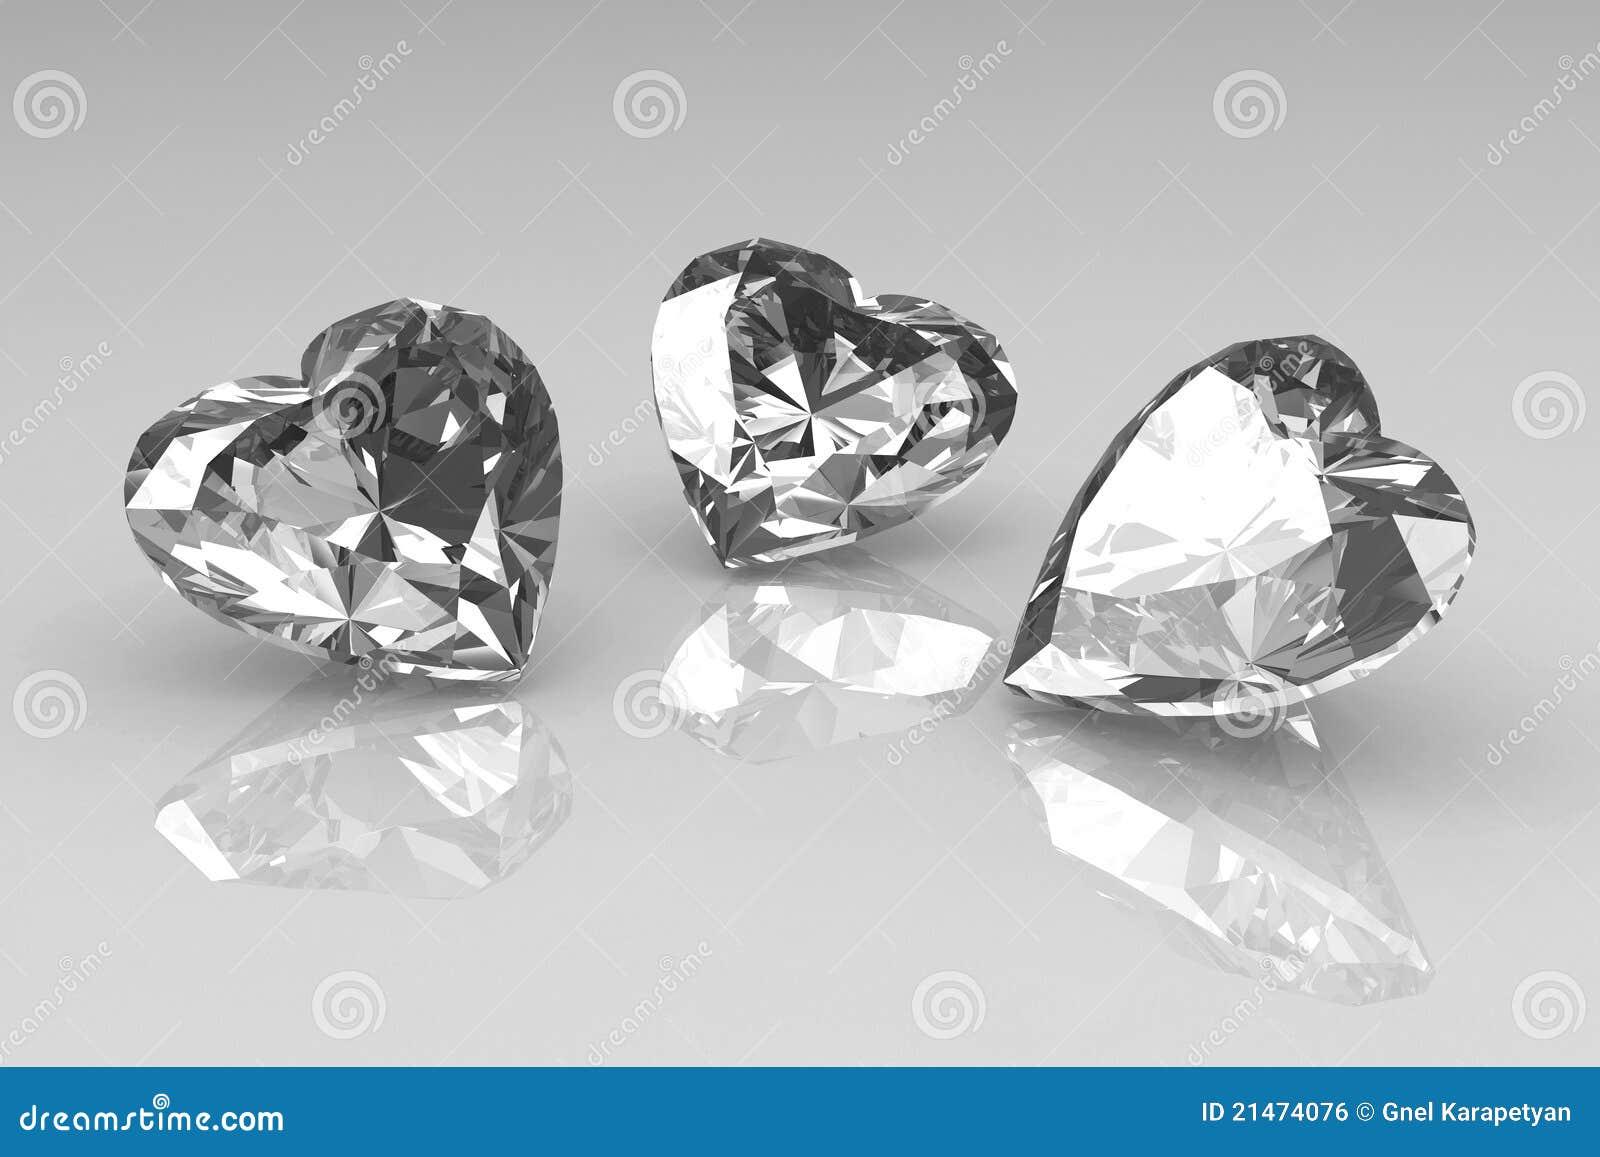 Nenhum diamante neste mundo